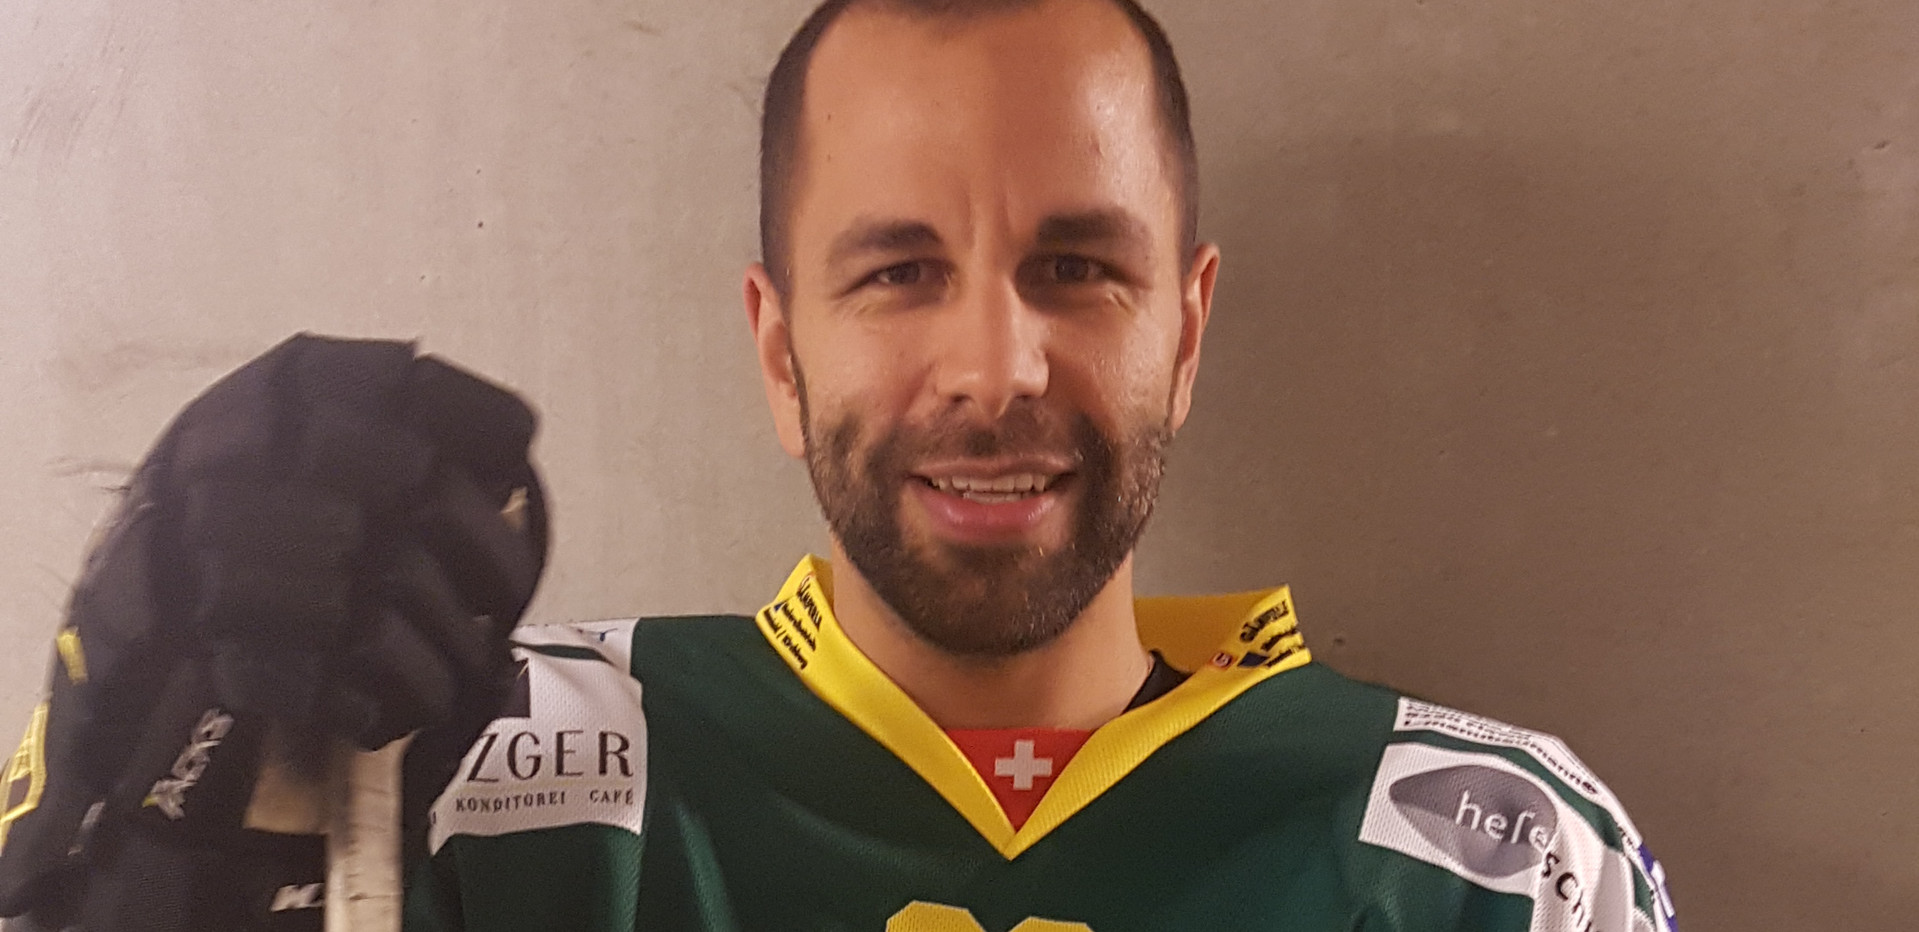 Michael Heuberger #26